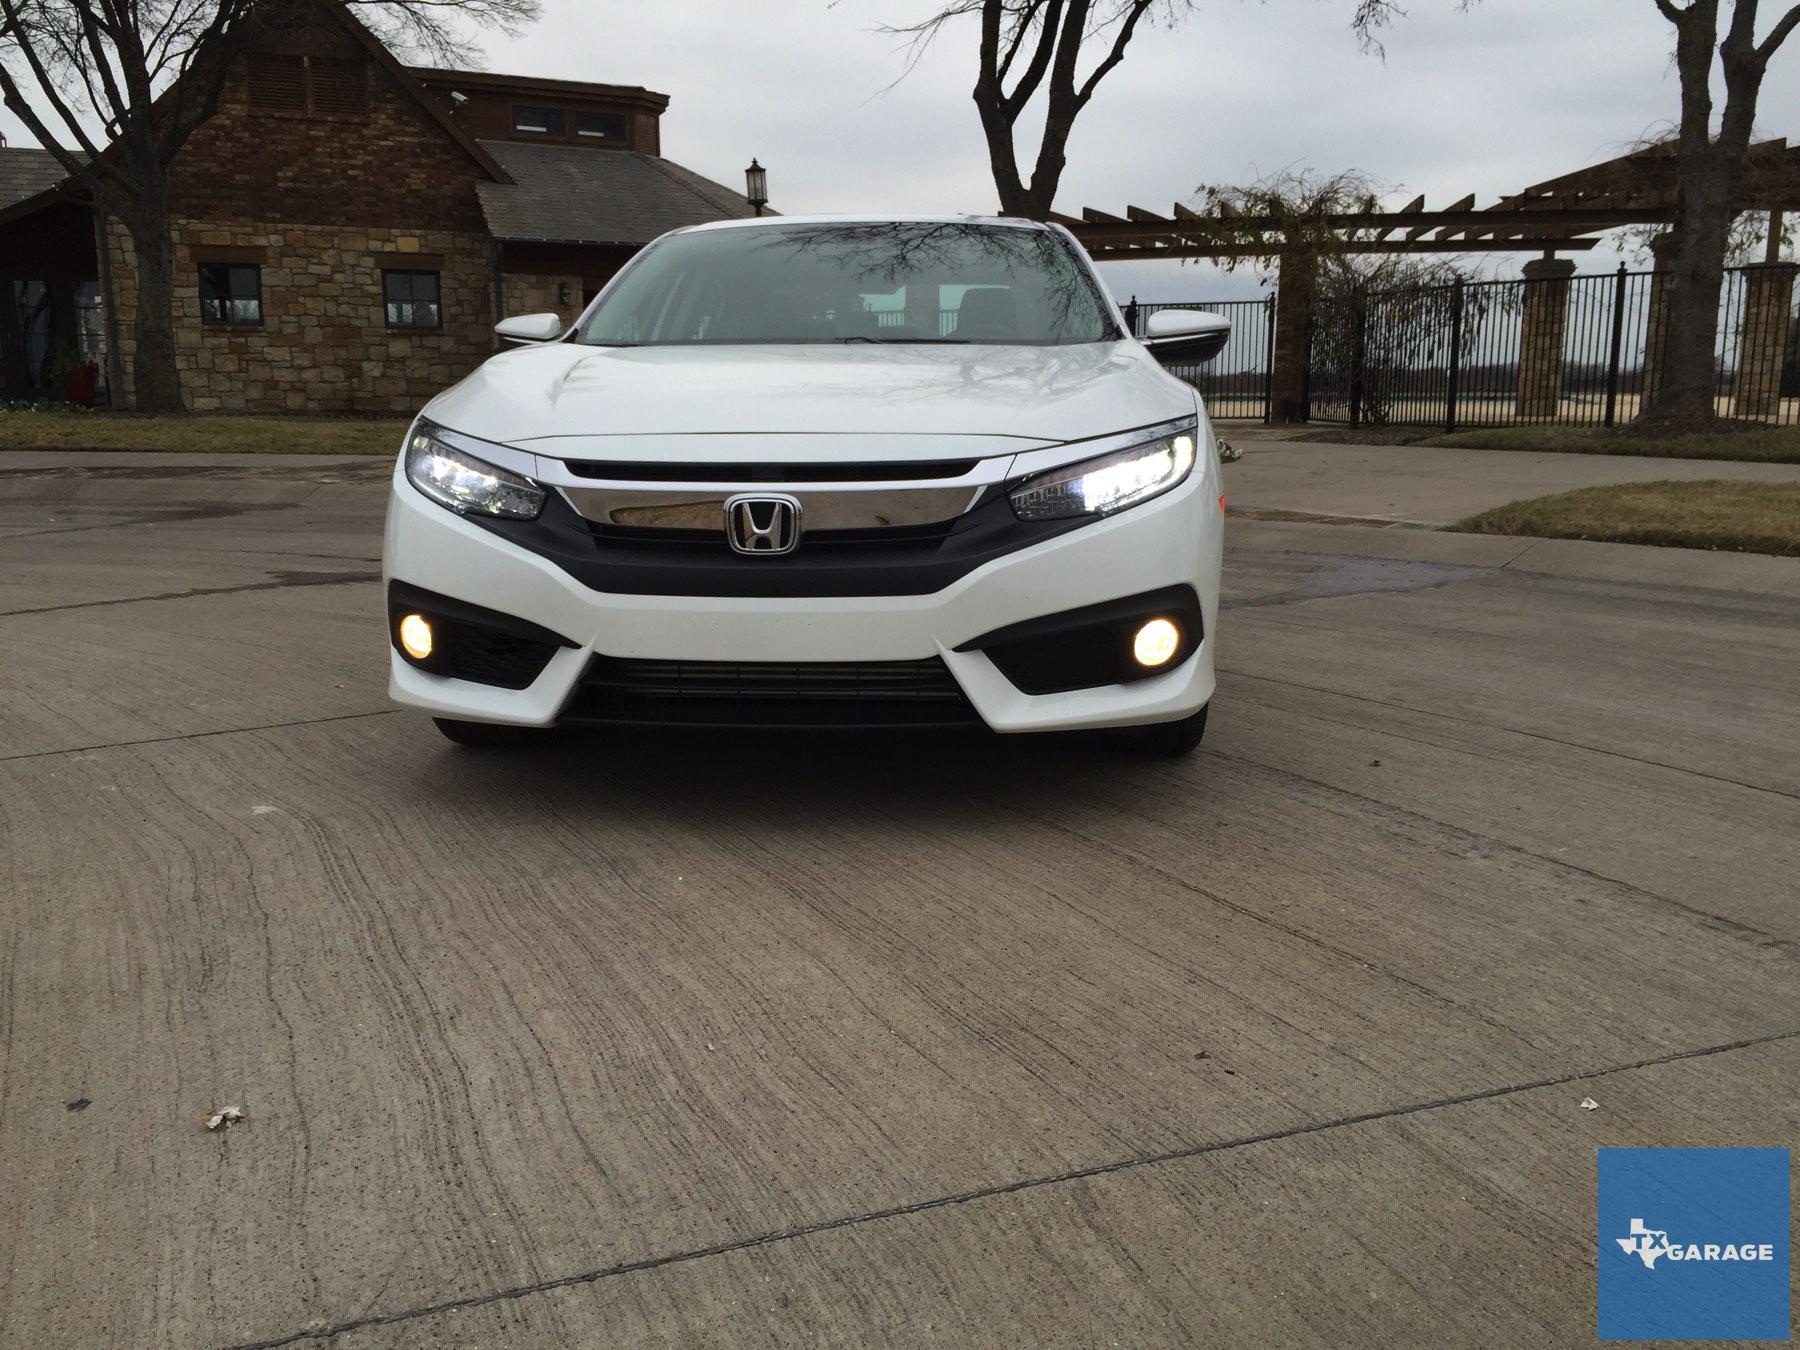 2016-Honda-Civic-by-txGarage-010